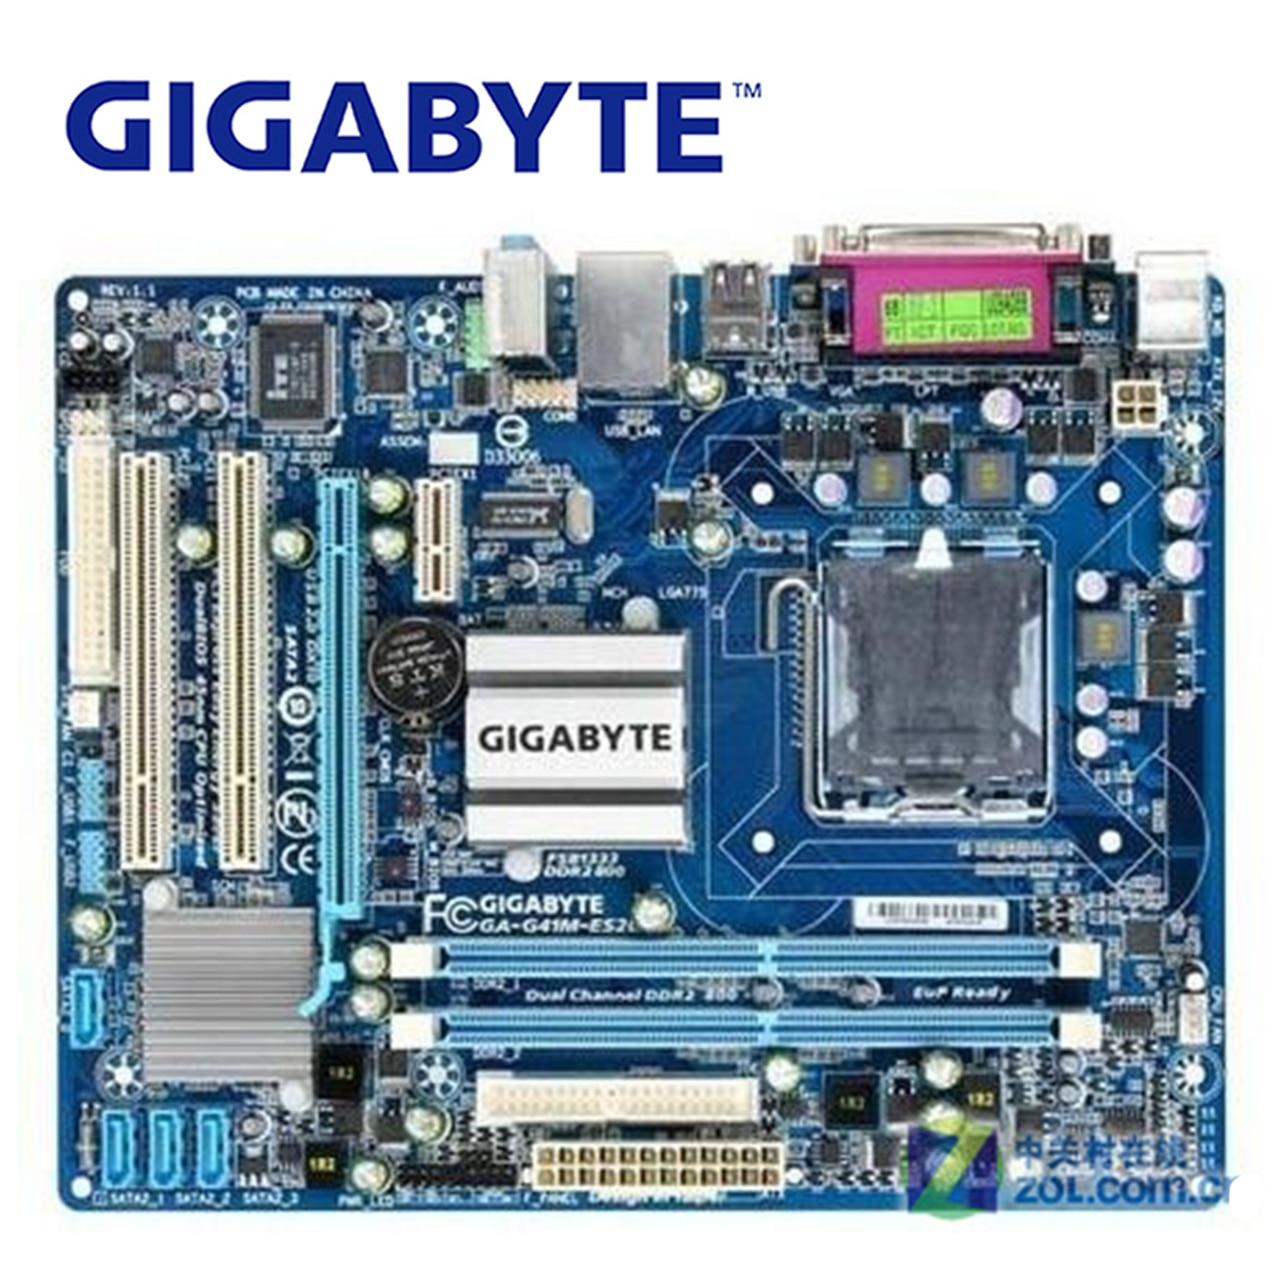 LGA 775 DDR2 For Intel Gigabyte GA-G41M-ES2L 100% Original Motherboard G41 G41M-ES2L Desktop Mainboard SATA 2 Systemboard Used